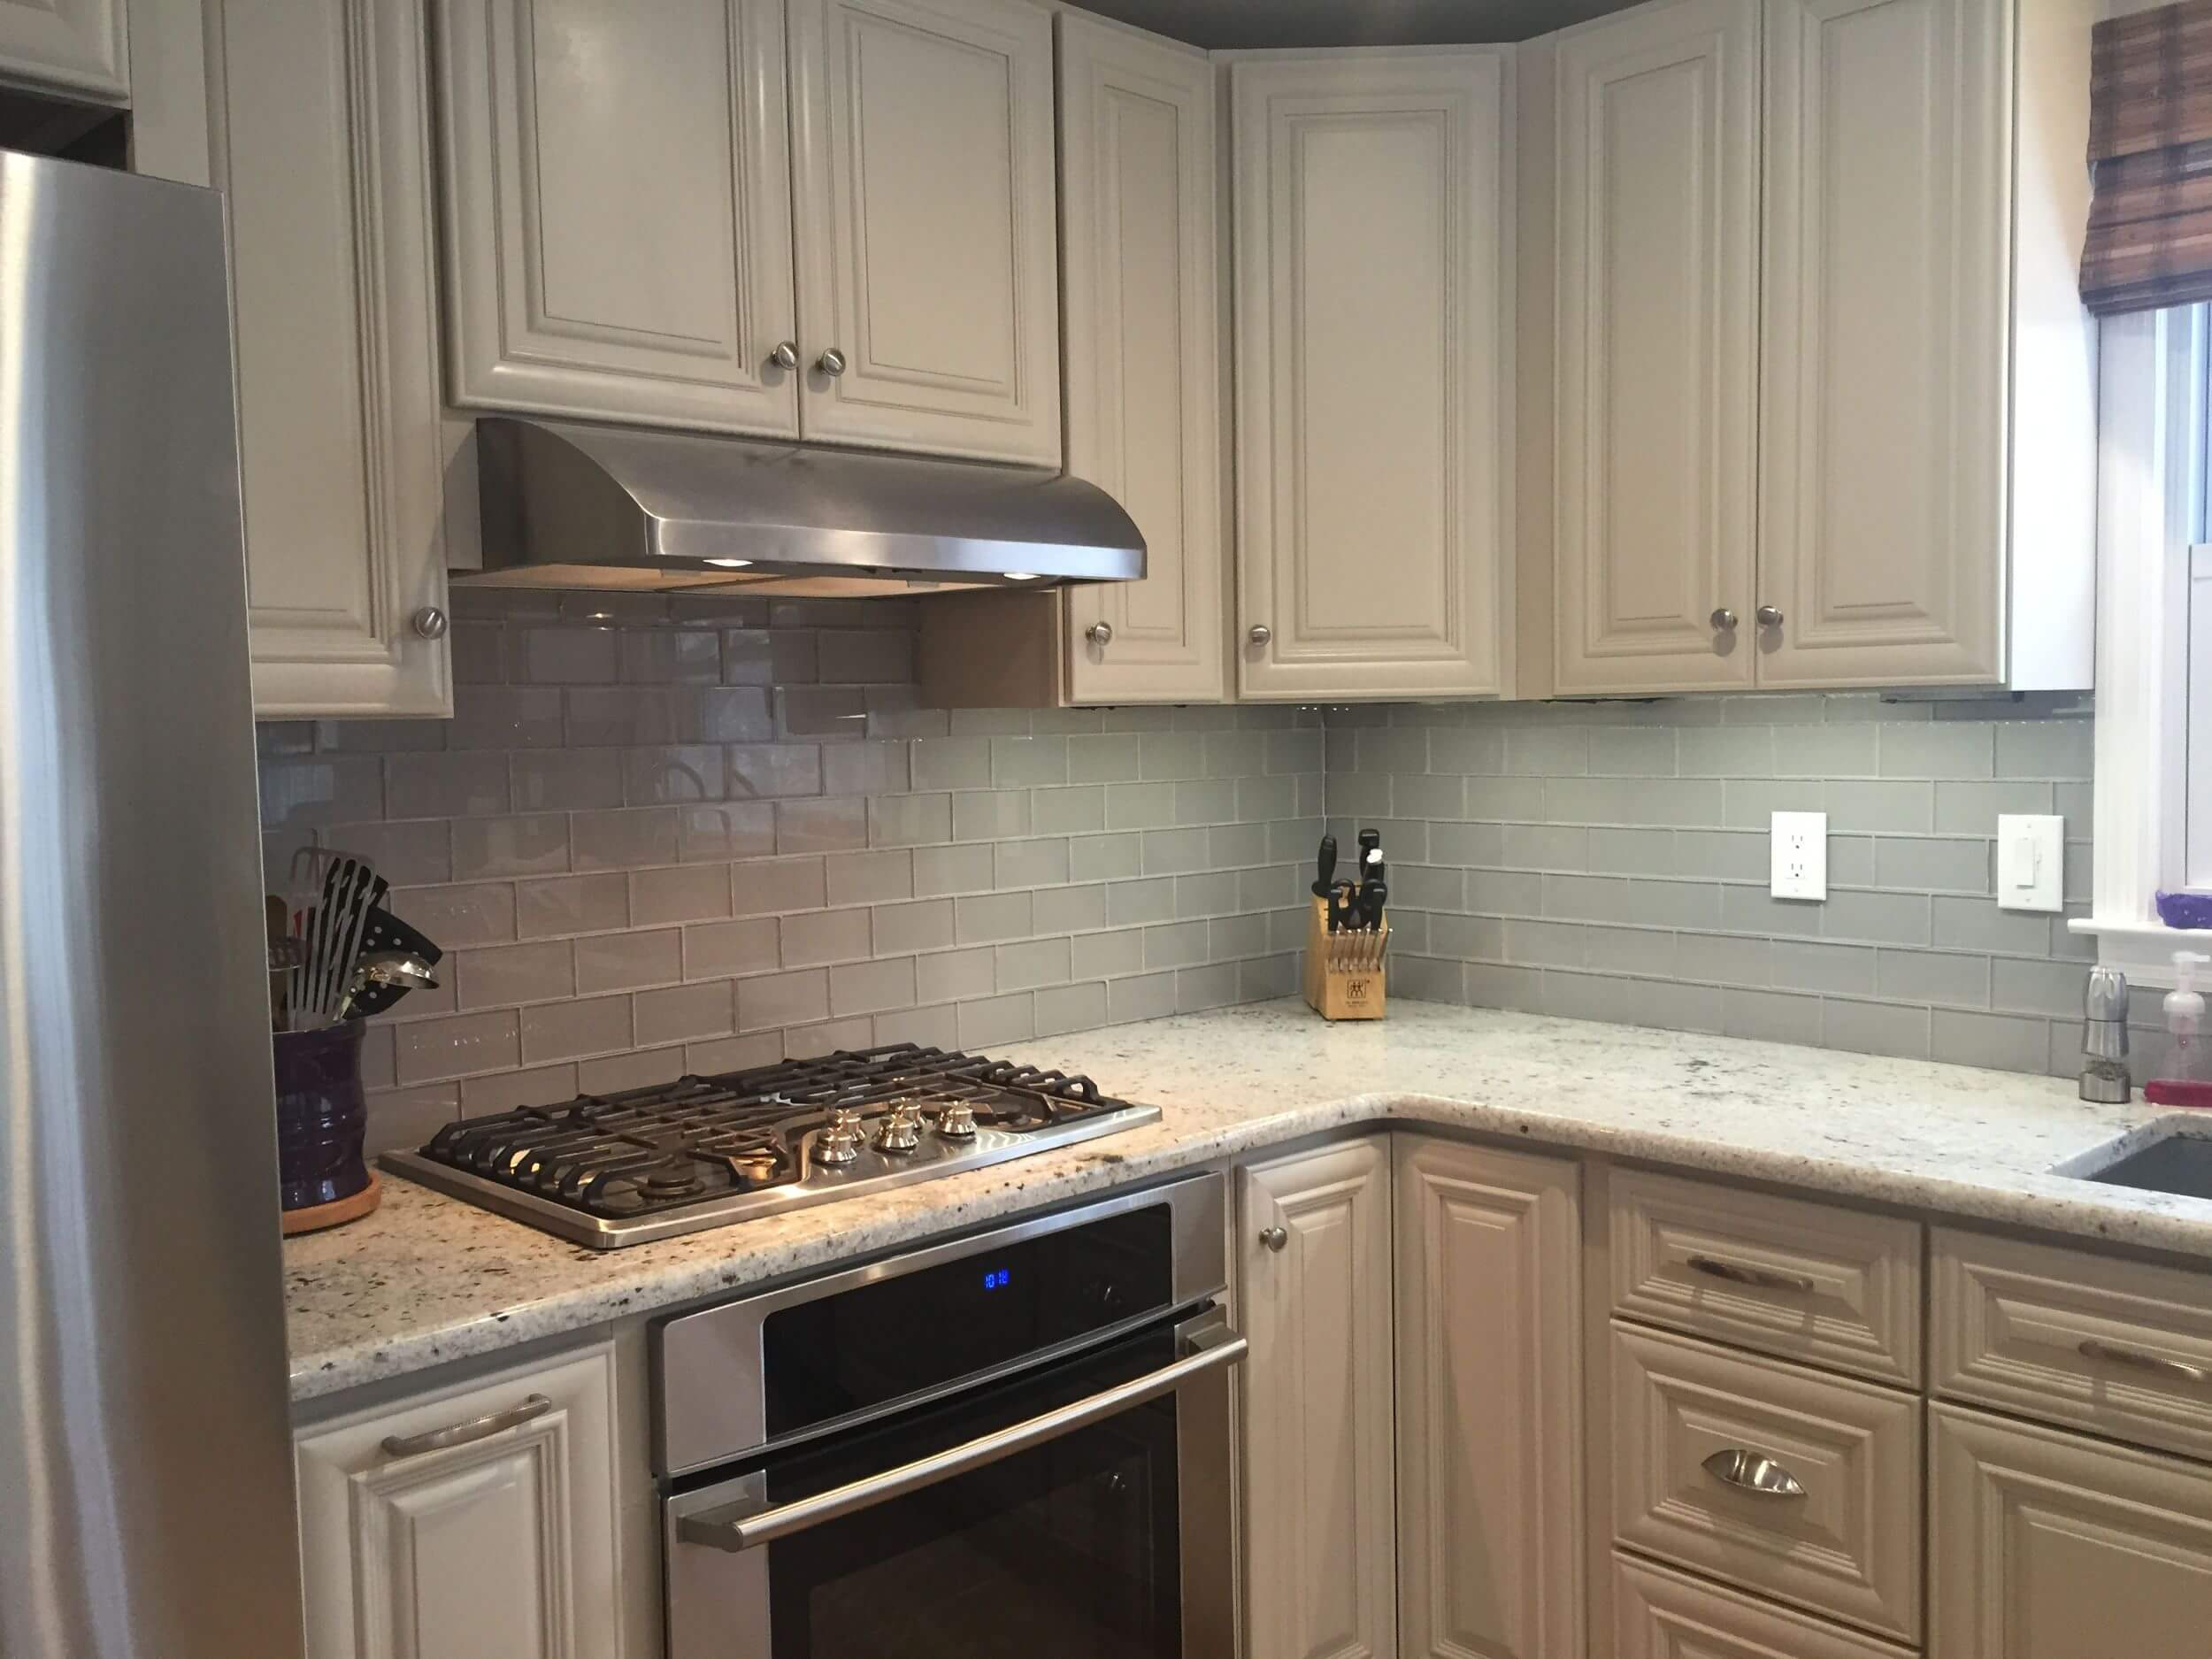 The Best Kitchen Tile Backsplash Ideas 2019 on Countertops Backsplash Ideas  id=72394